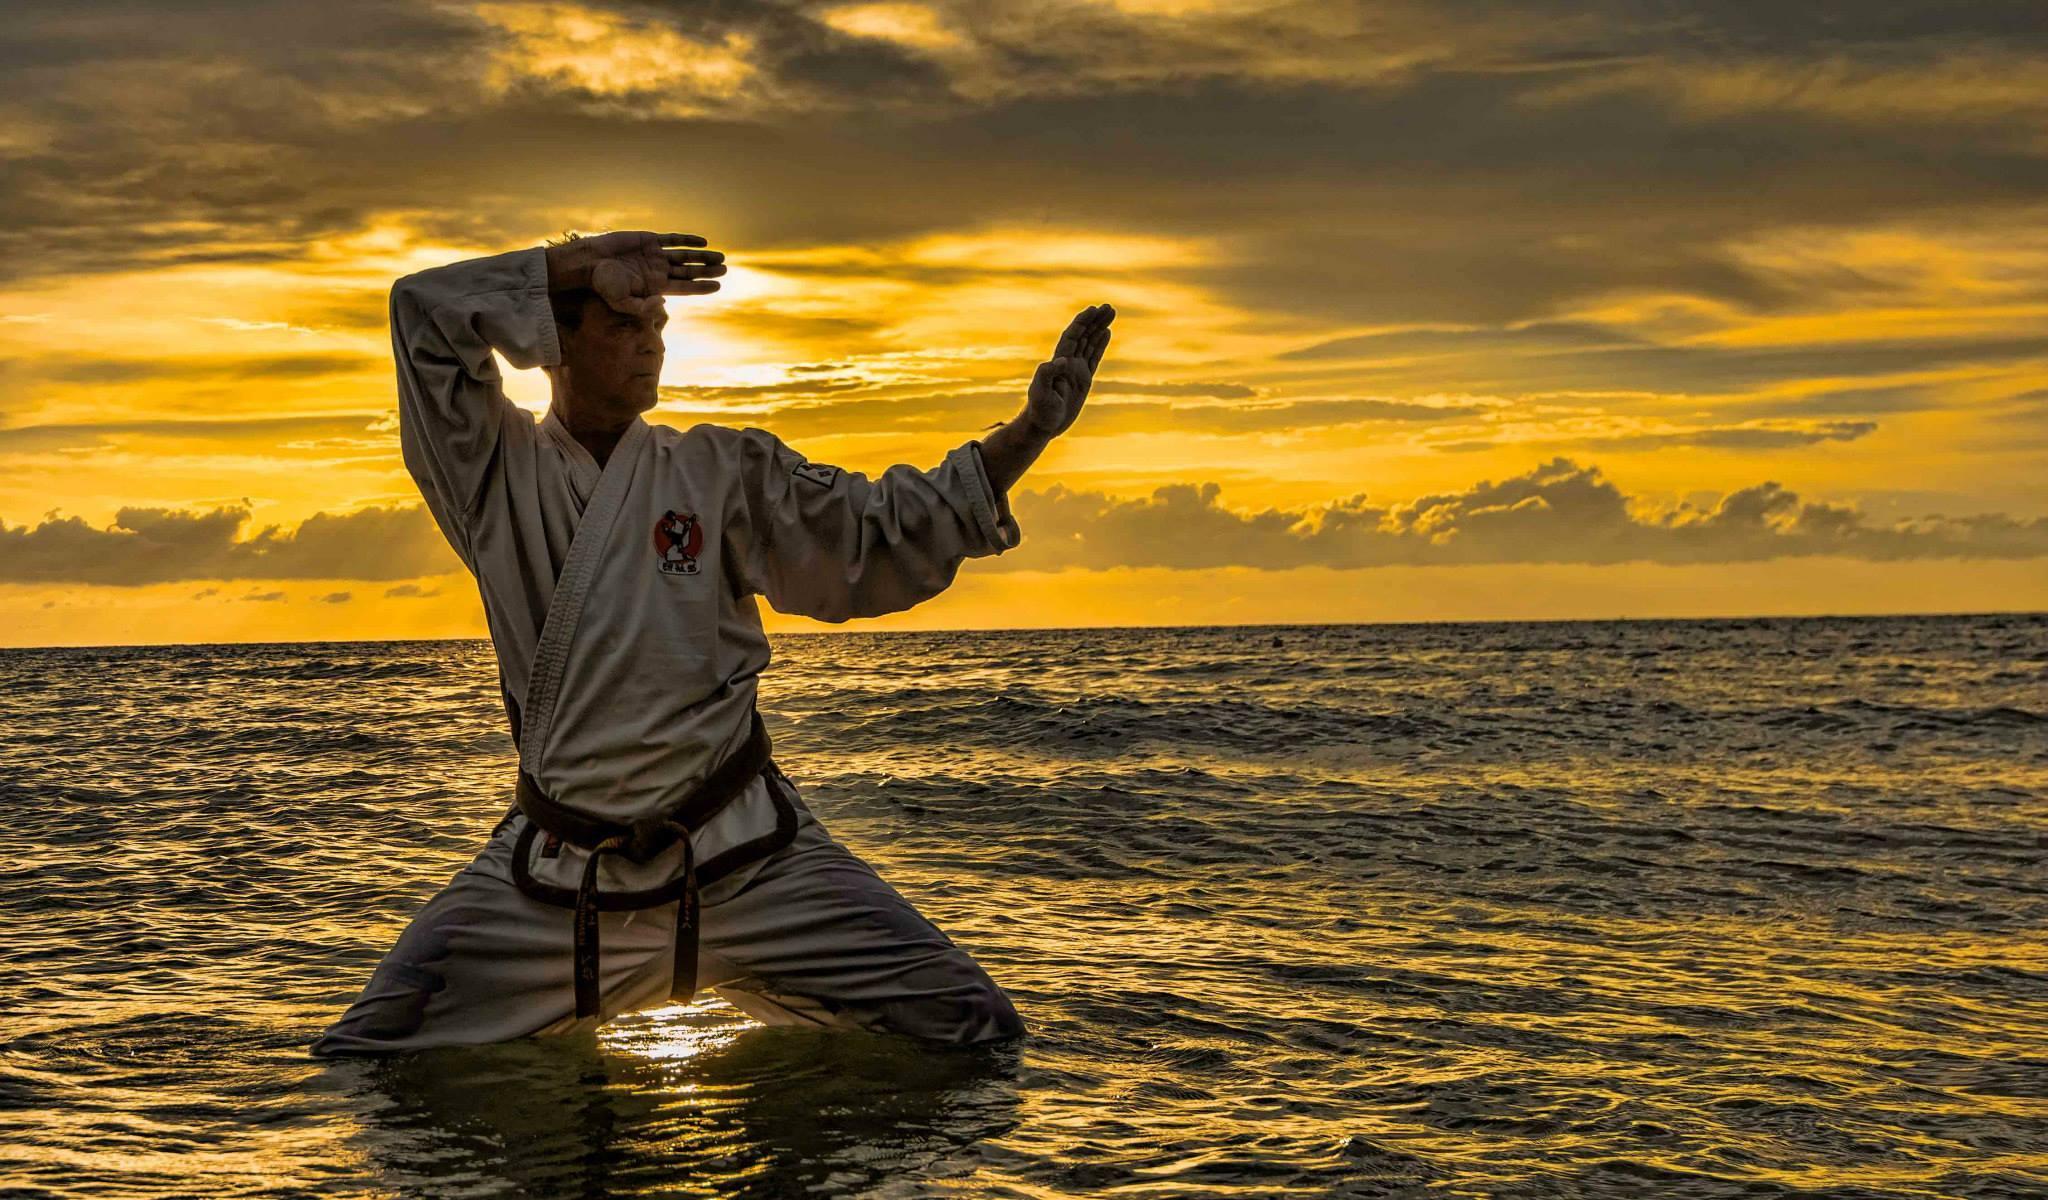 Großmeister Brunner USA Florida Kampfkunst Lehrgang YOUNG-UNG Taekwondo